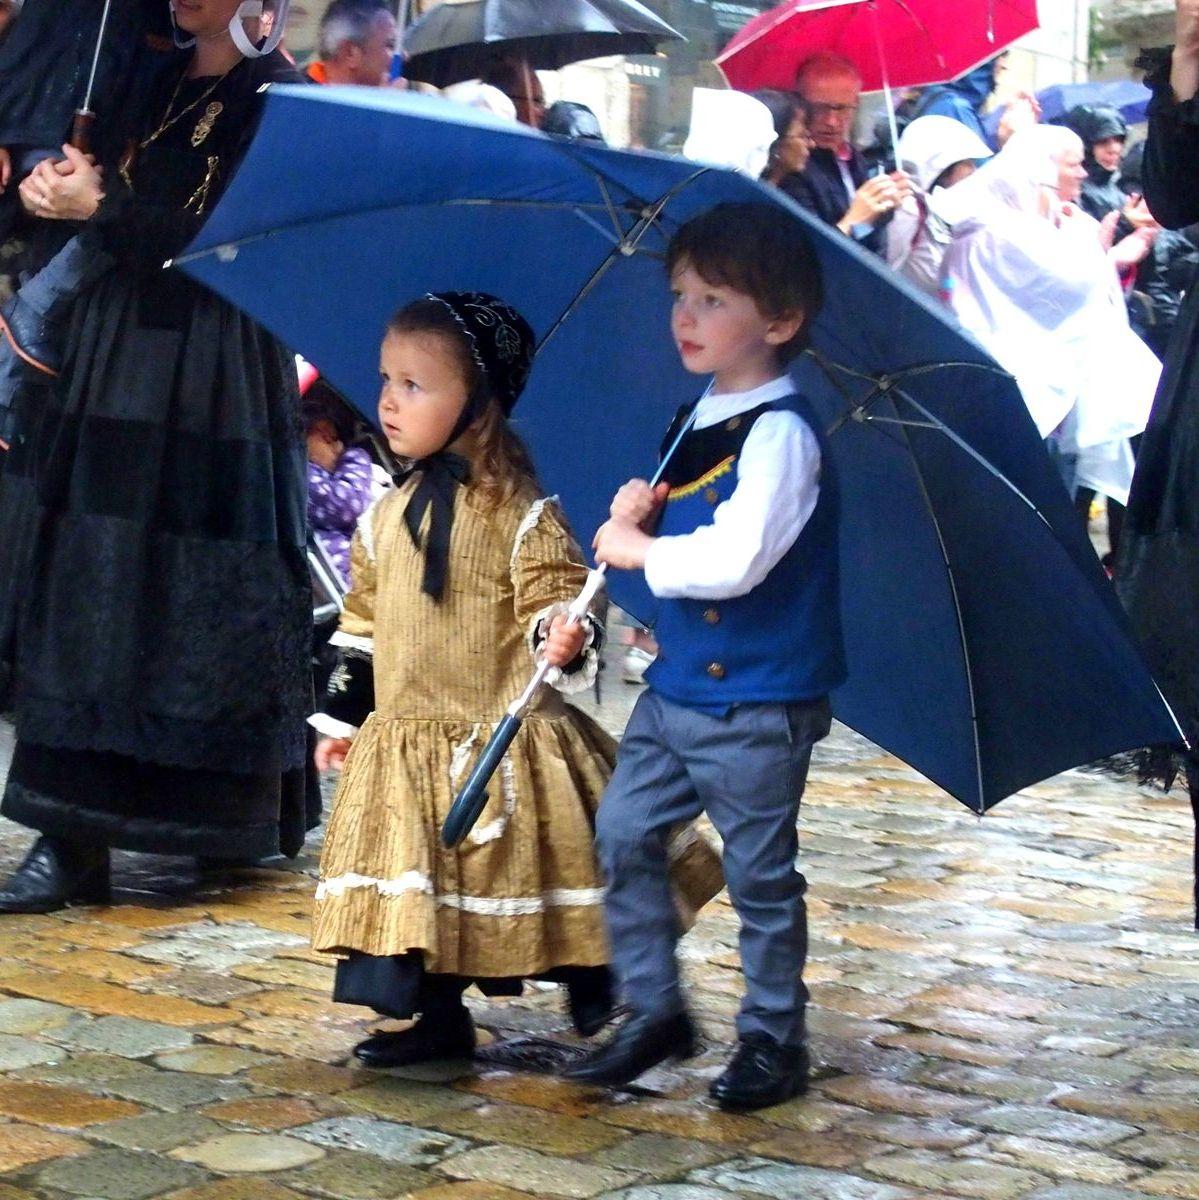 Enfants en costume breton Quimper Bretagne